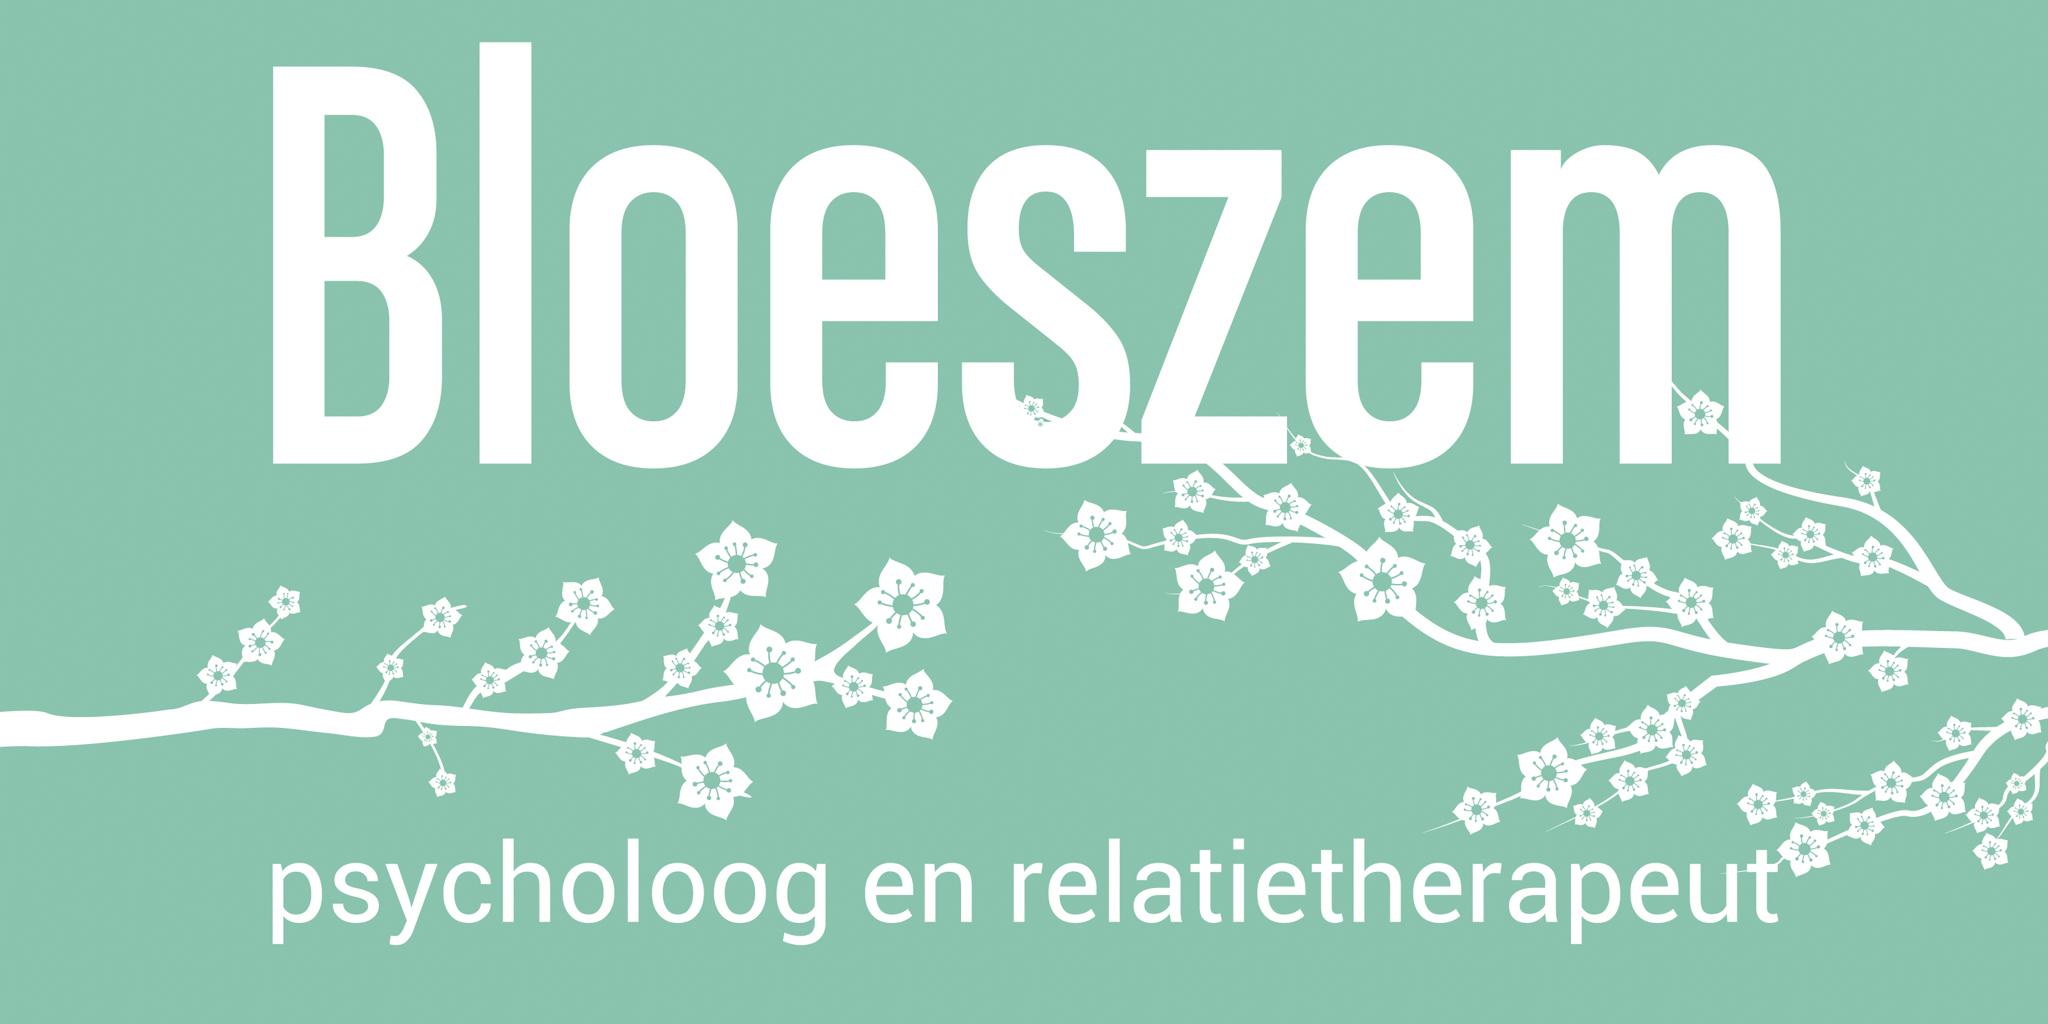 Bloeszem logo V7_Tekengebied 111